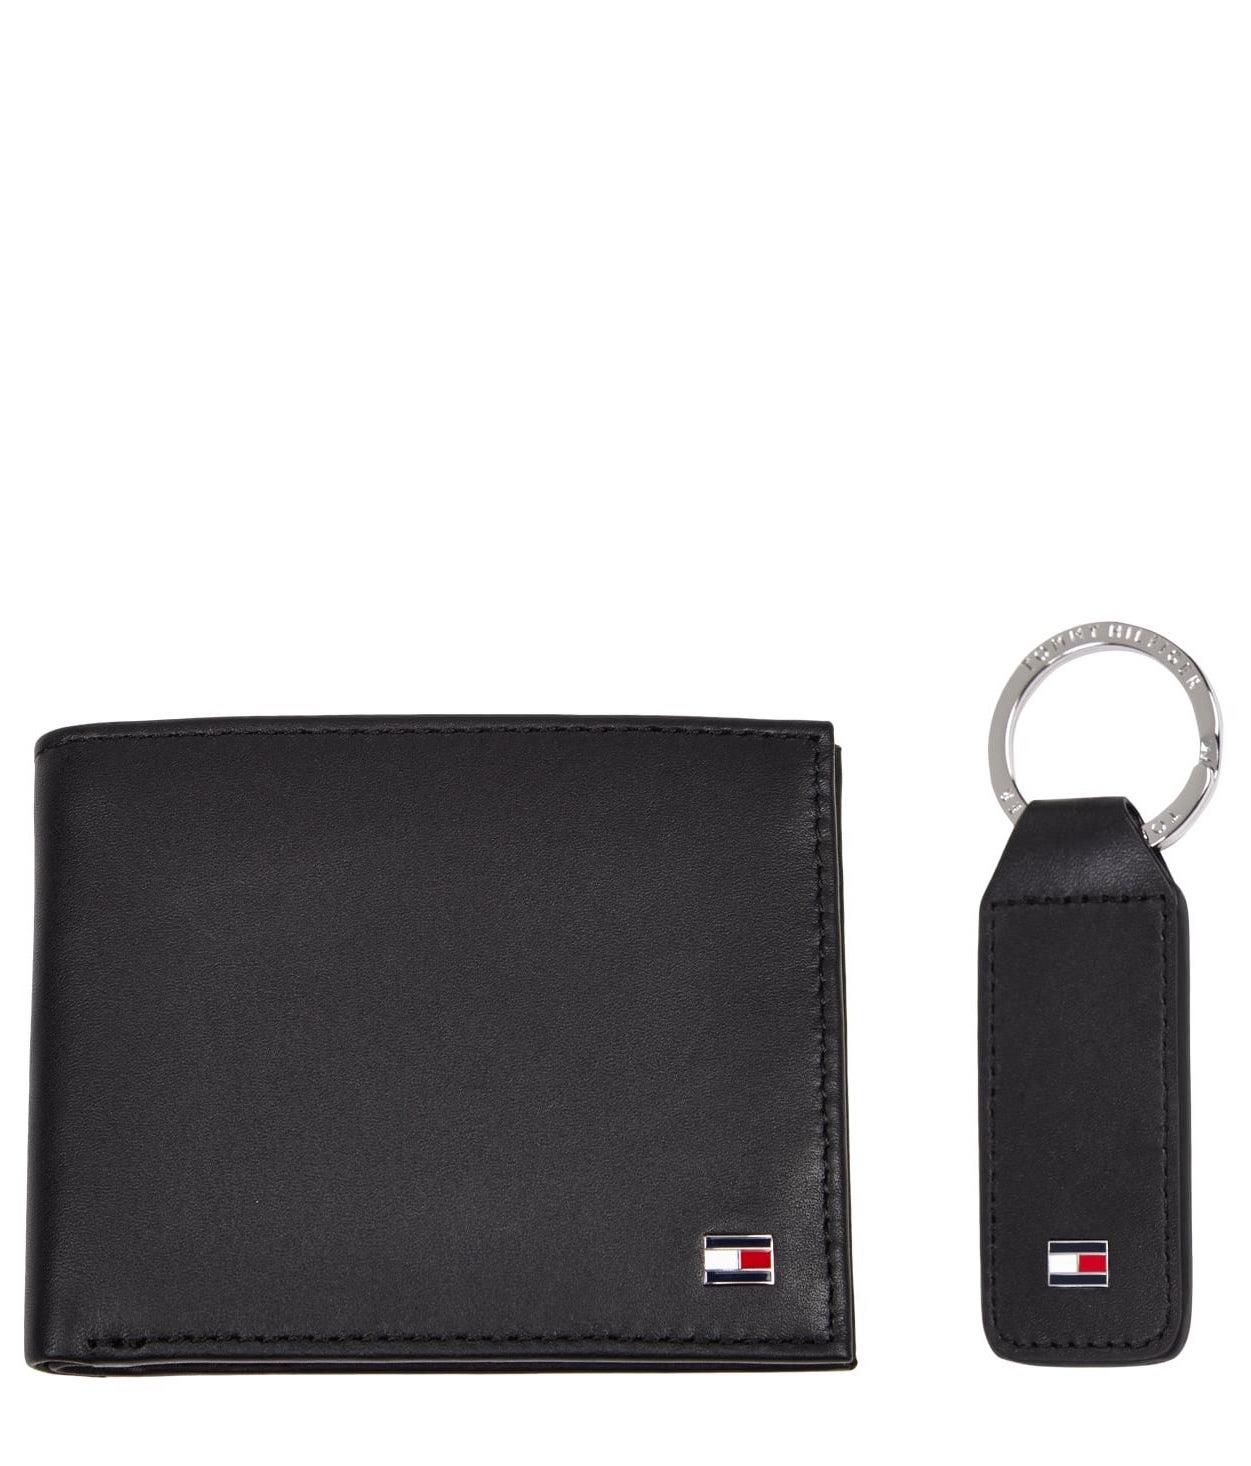 Tommy Hilfiger Cadeauset Portemonnee + Sleutelhanger, zwart